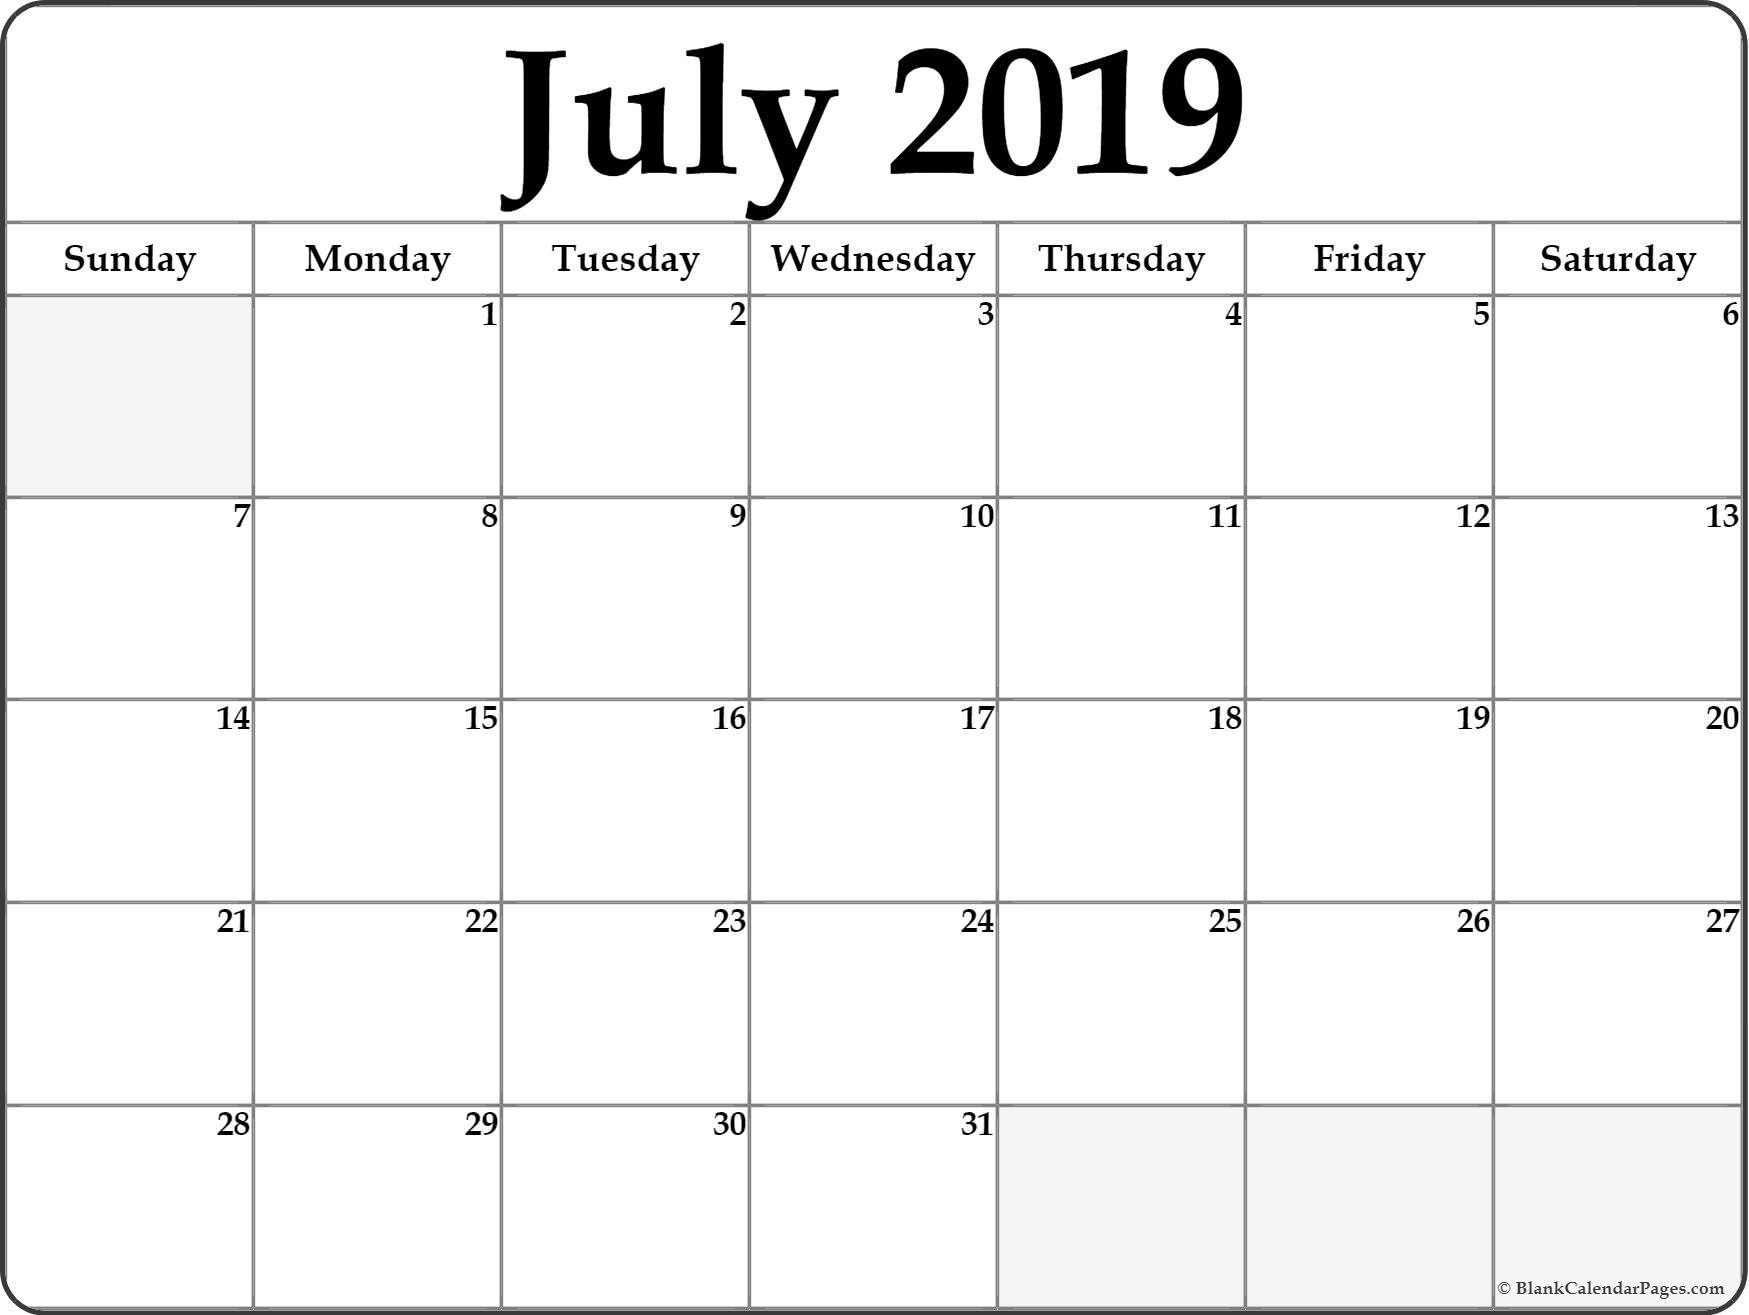 July 2019 Calendar | Free Printable Monthly Calendars_Blank Calendar July 17